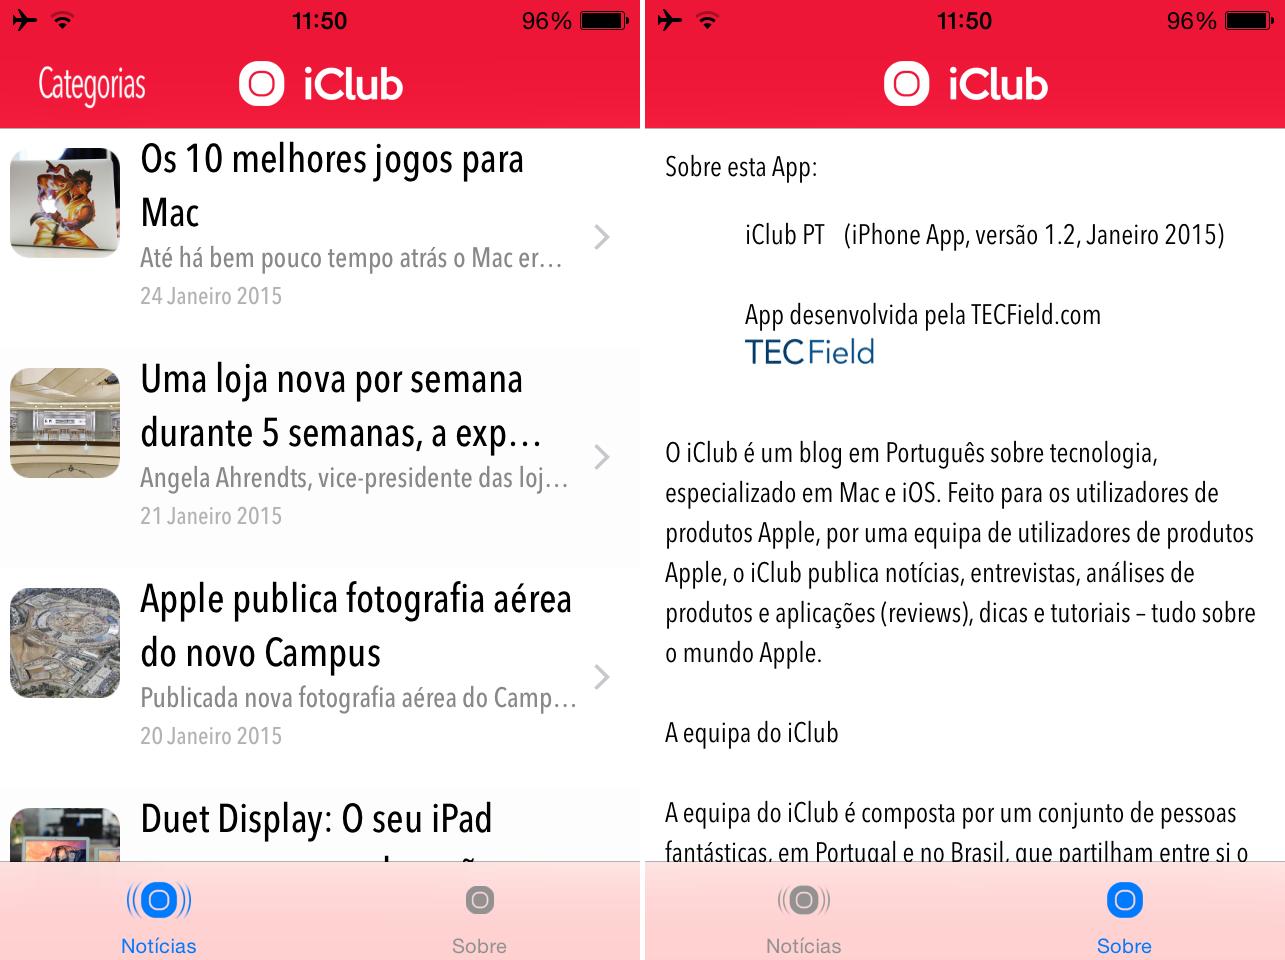 iclub-app-1.2